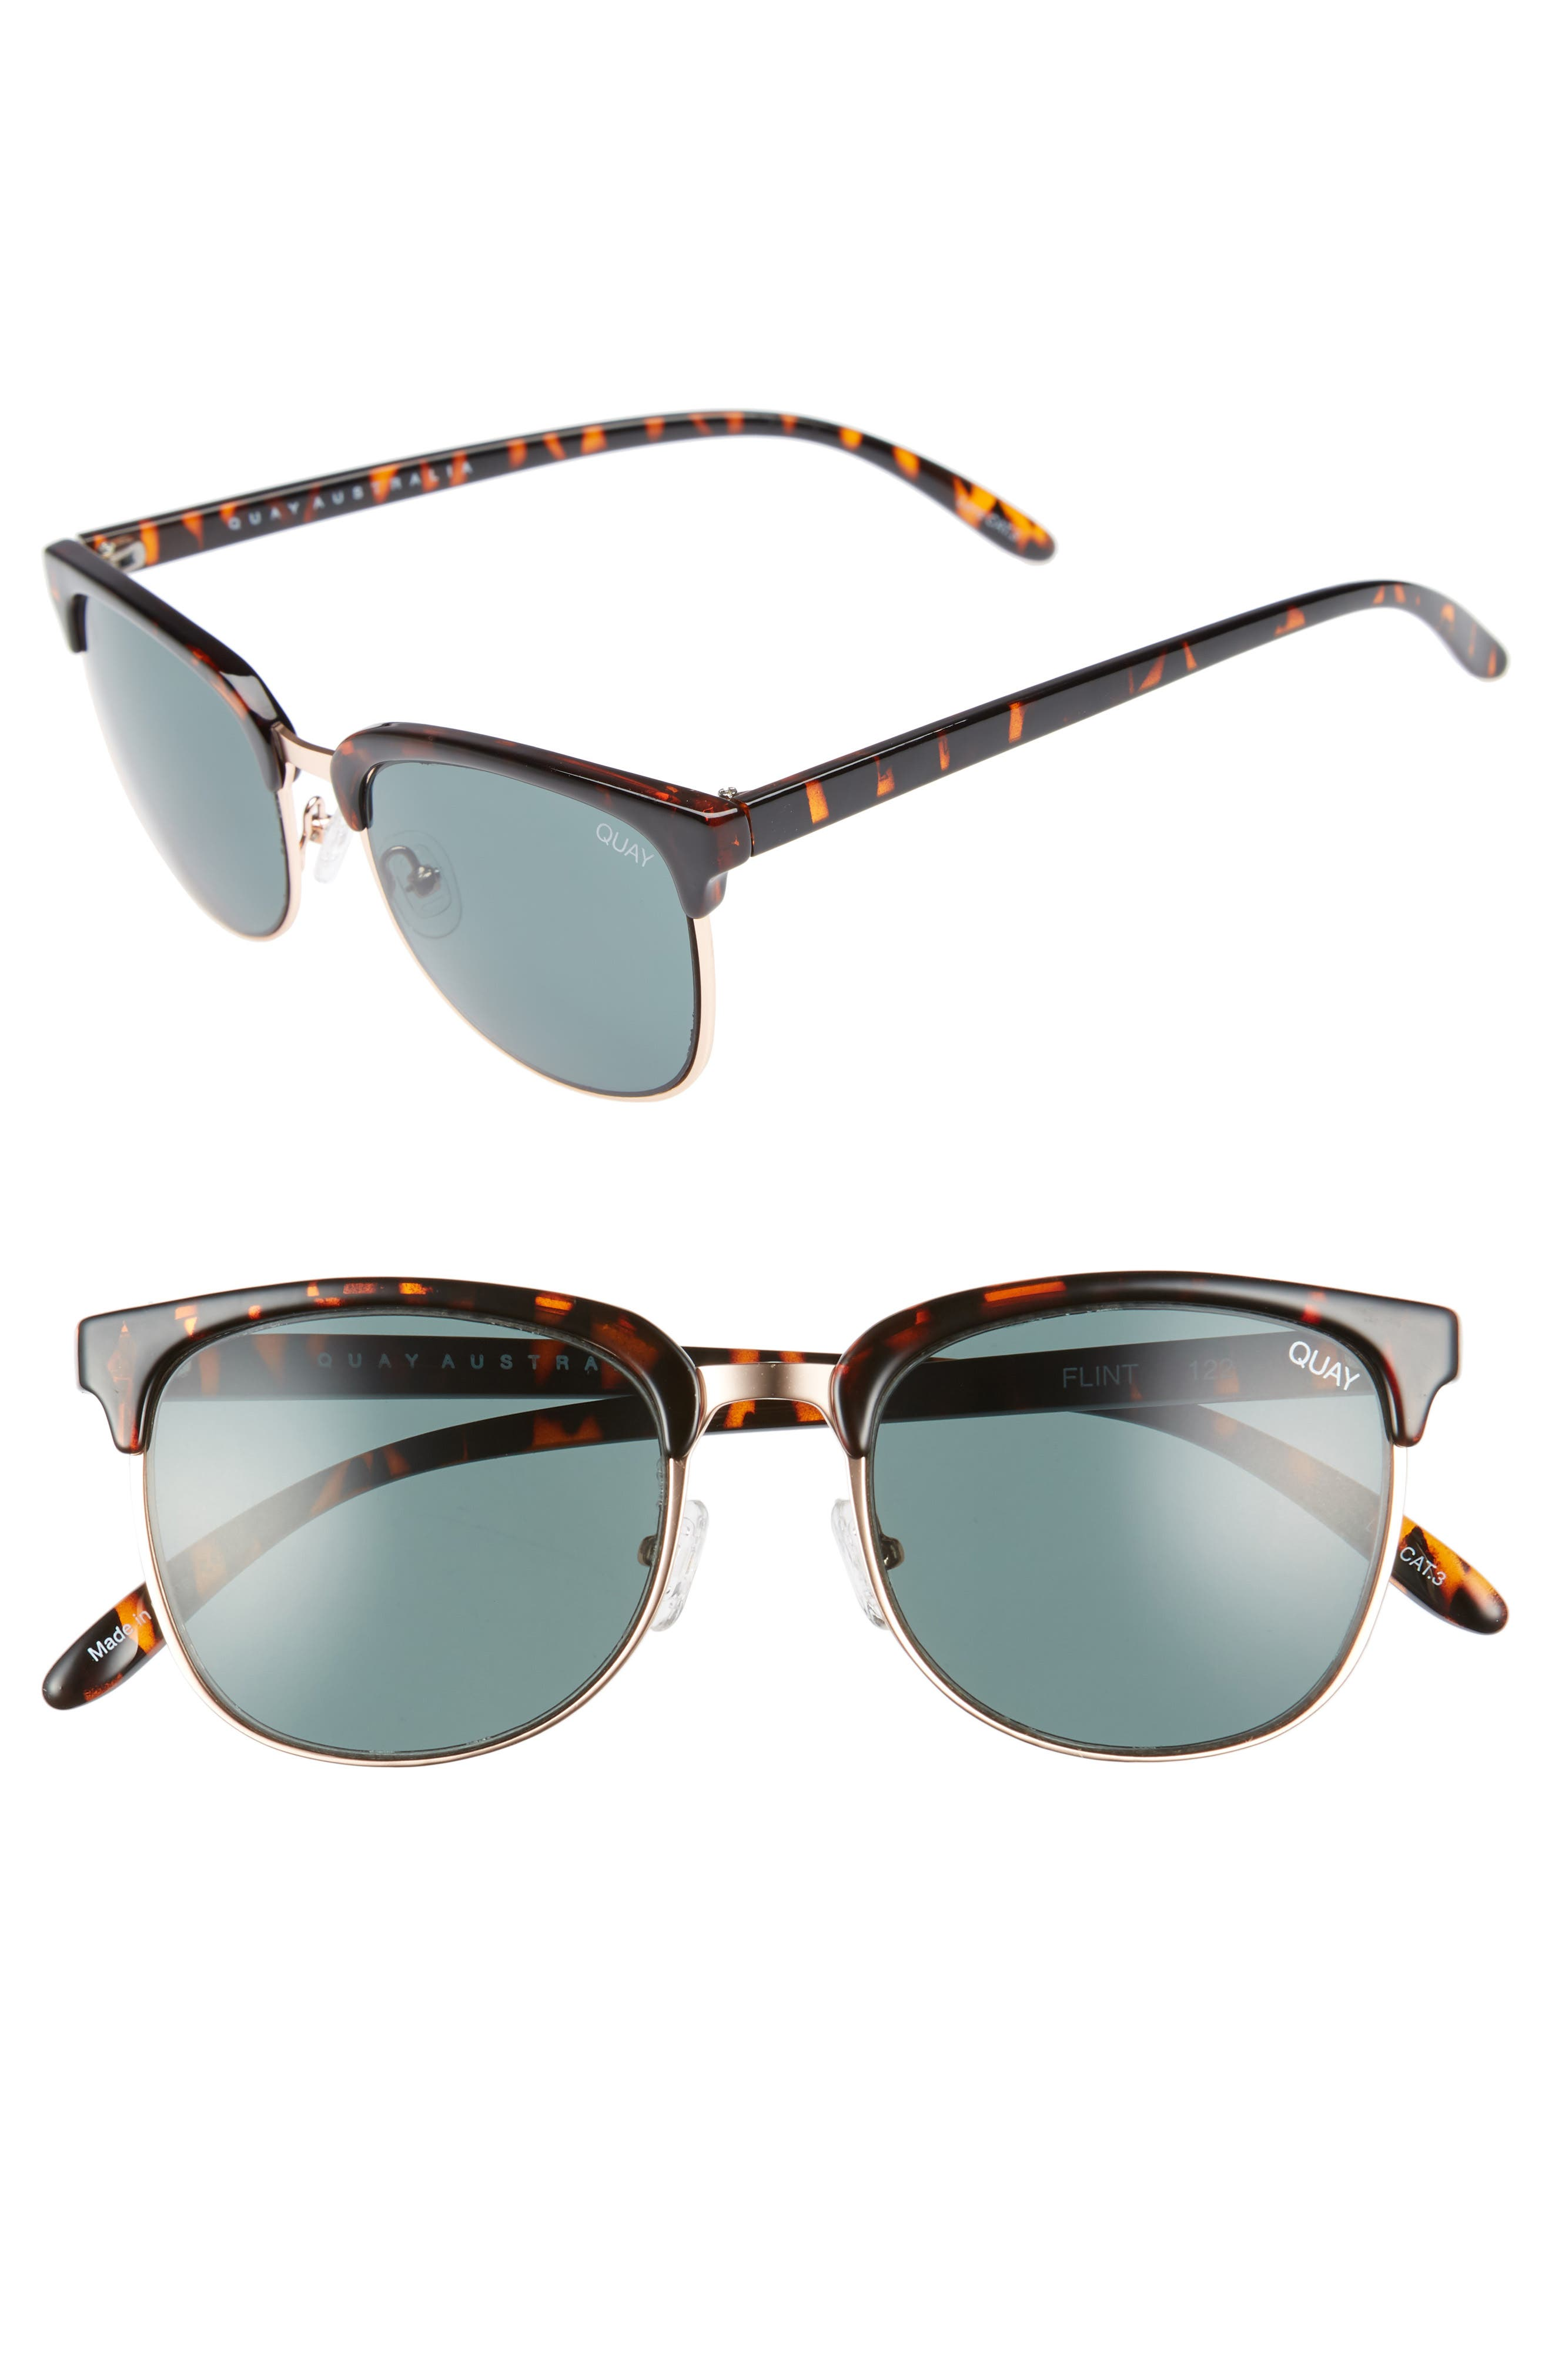 Flint 52mm Sunglasses,                         Main,                         color, 200